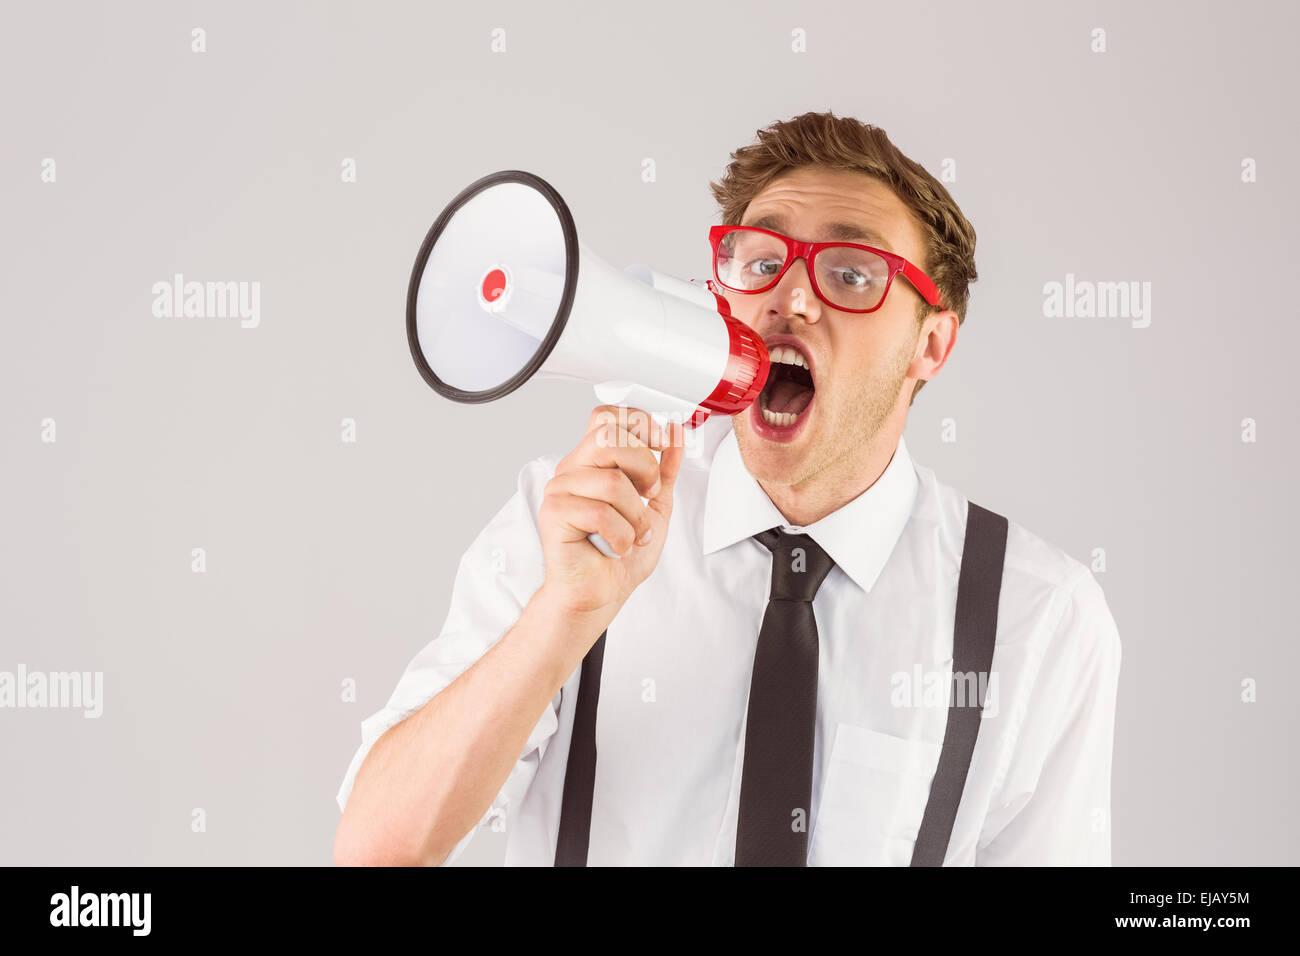 Geeky businessman shouting through megaphone - Stock Image